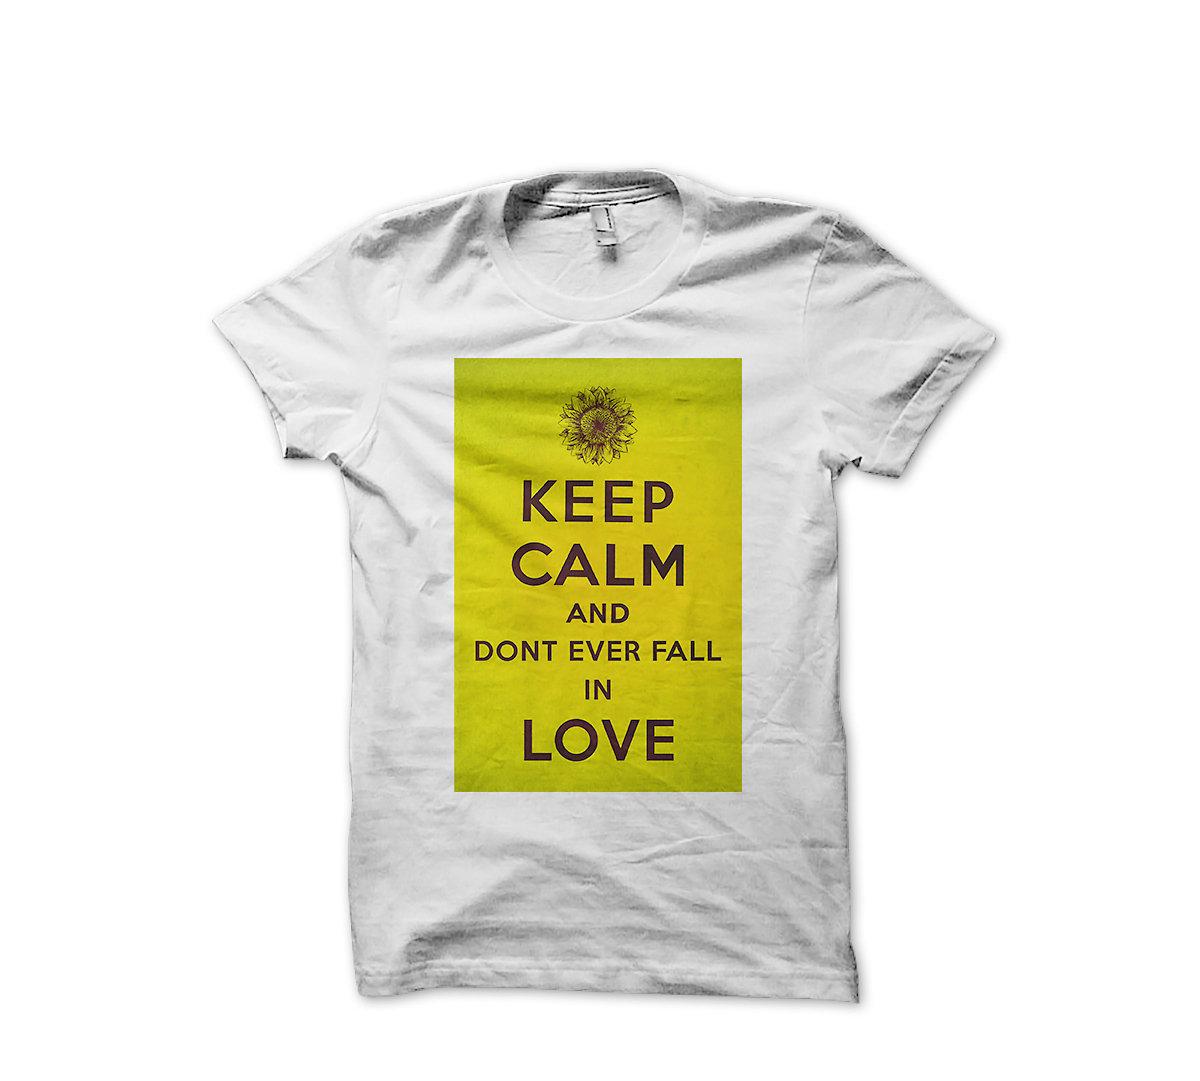 bfbdd0e18c850 Don't Ever Fall In Love